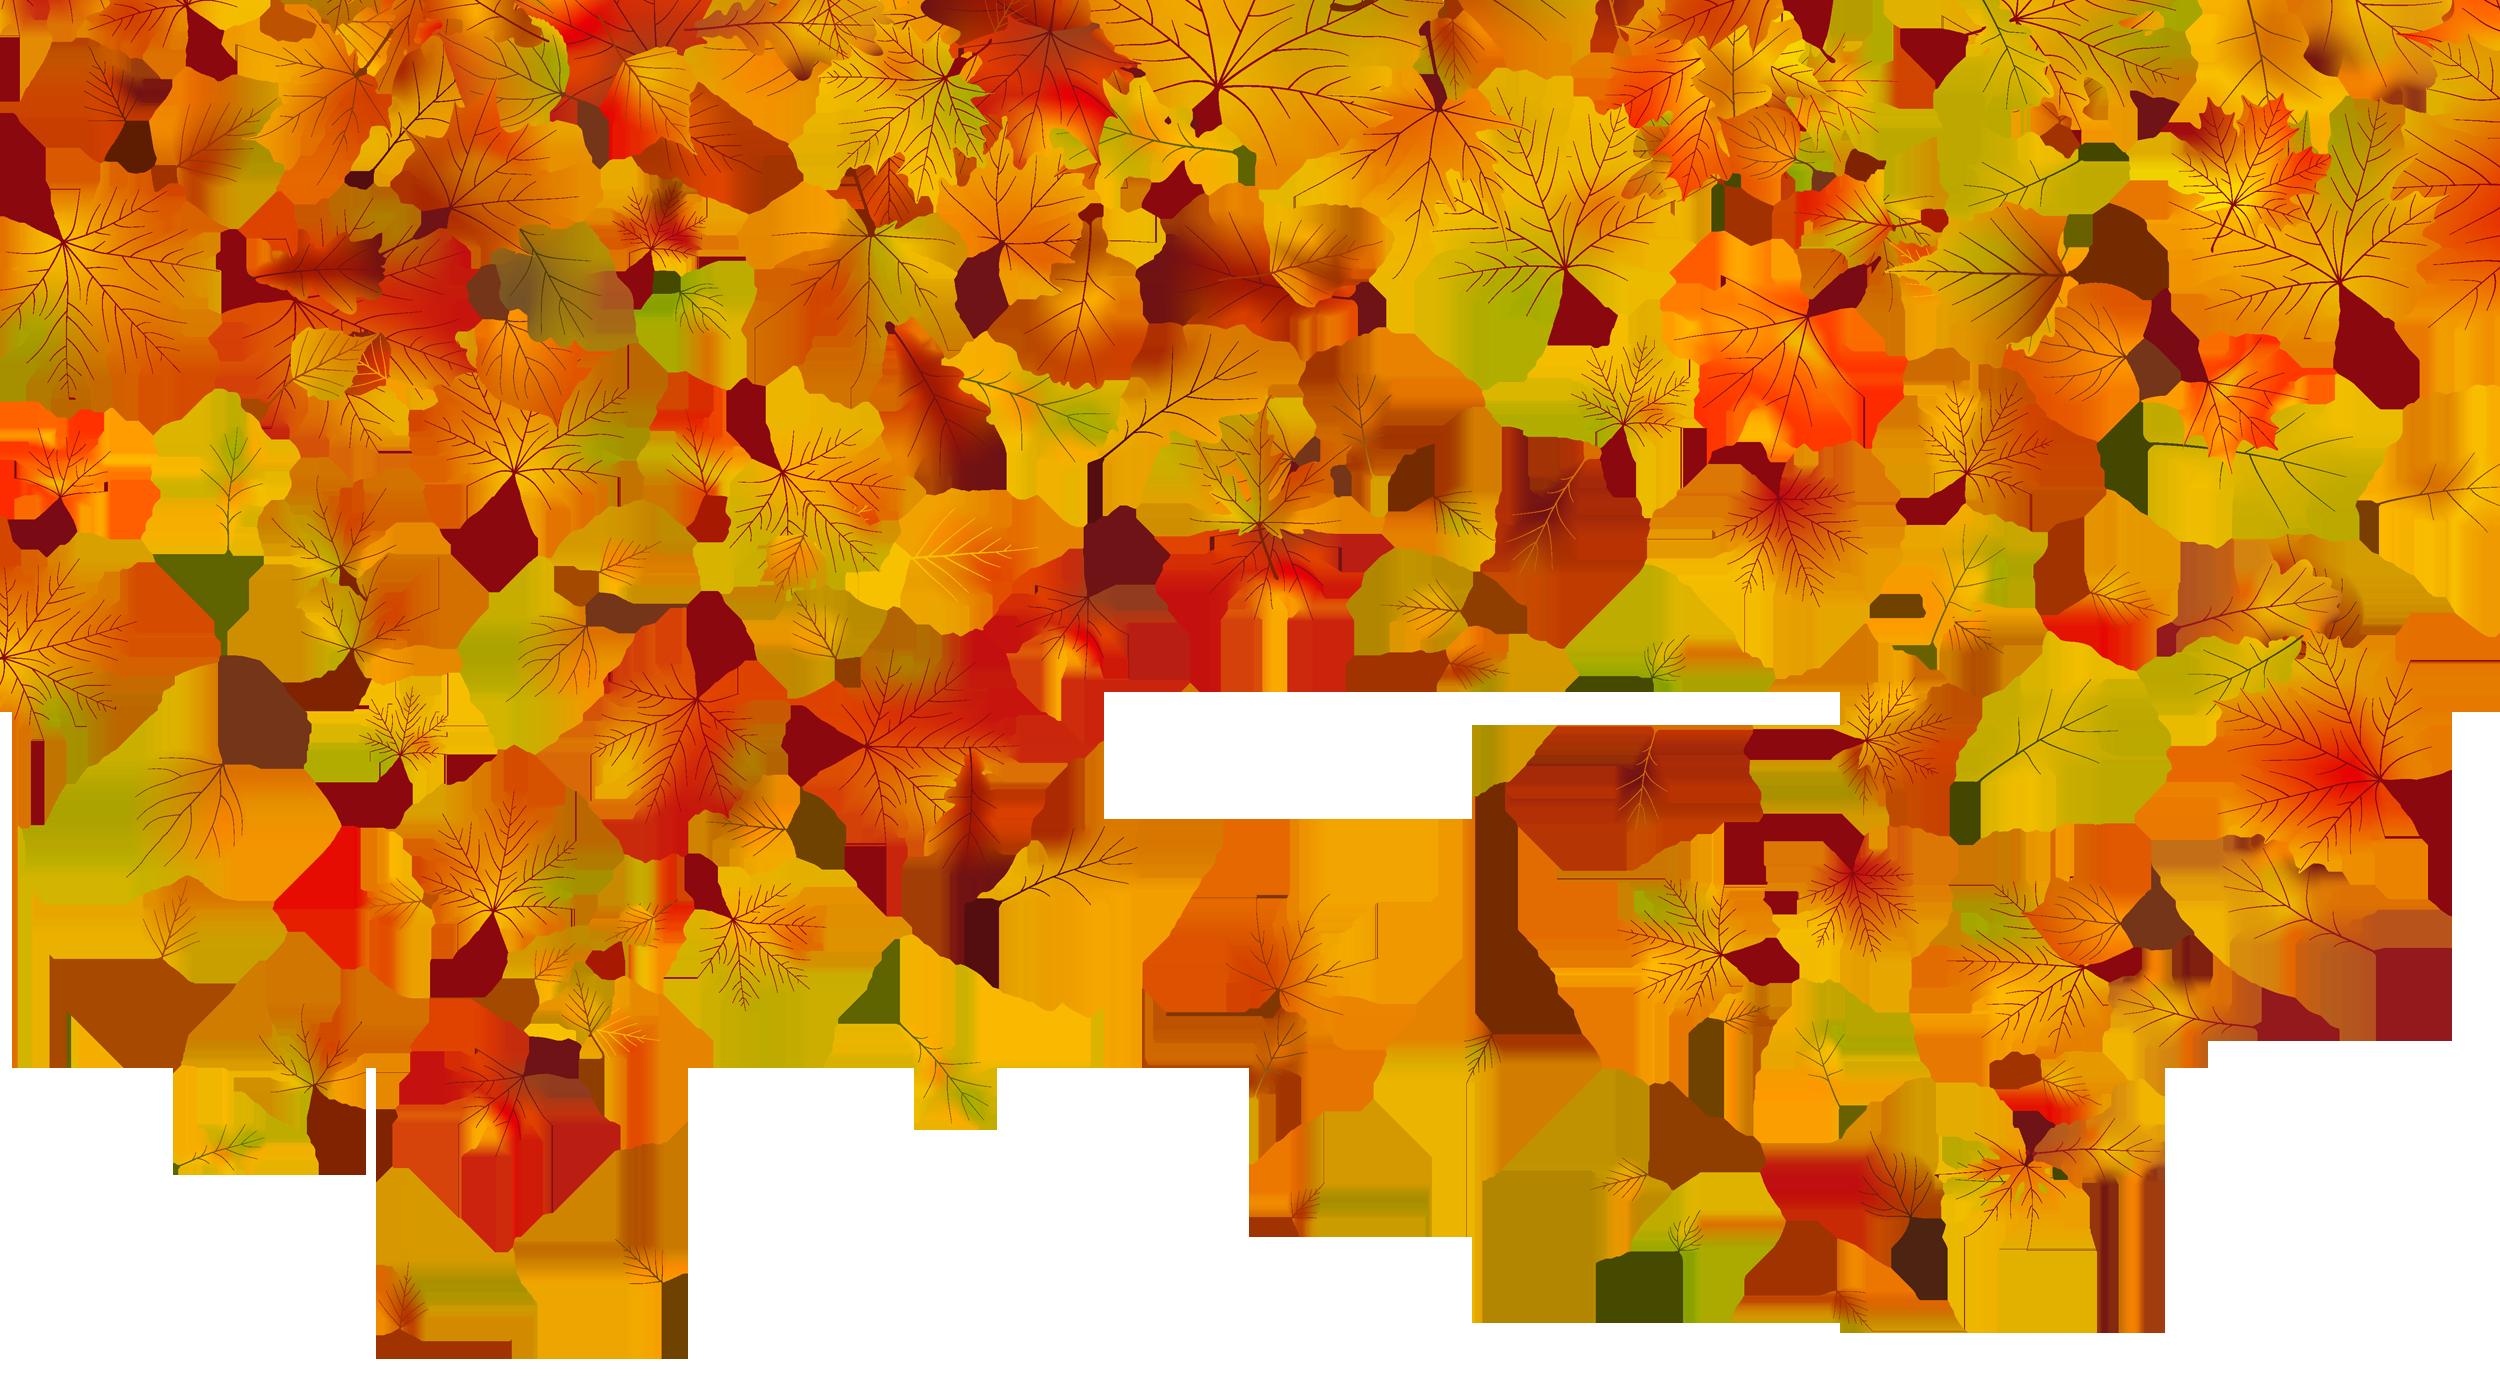 Autumn leaf color.